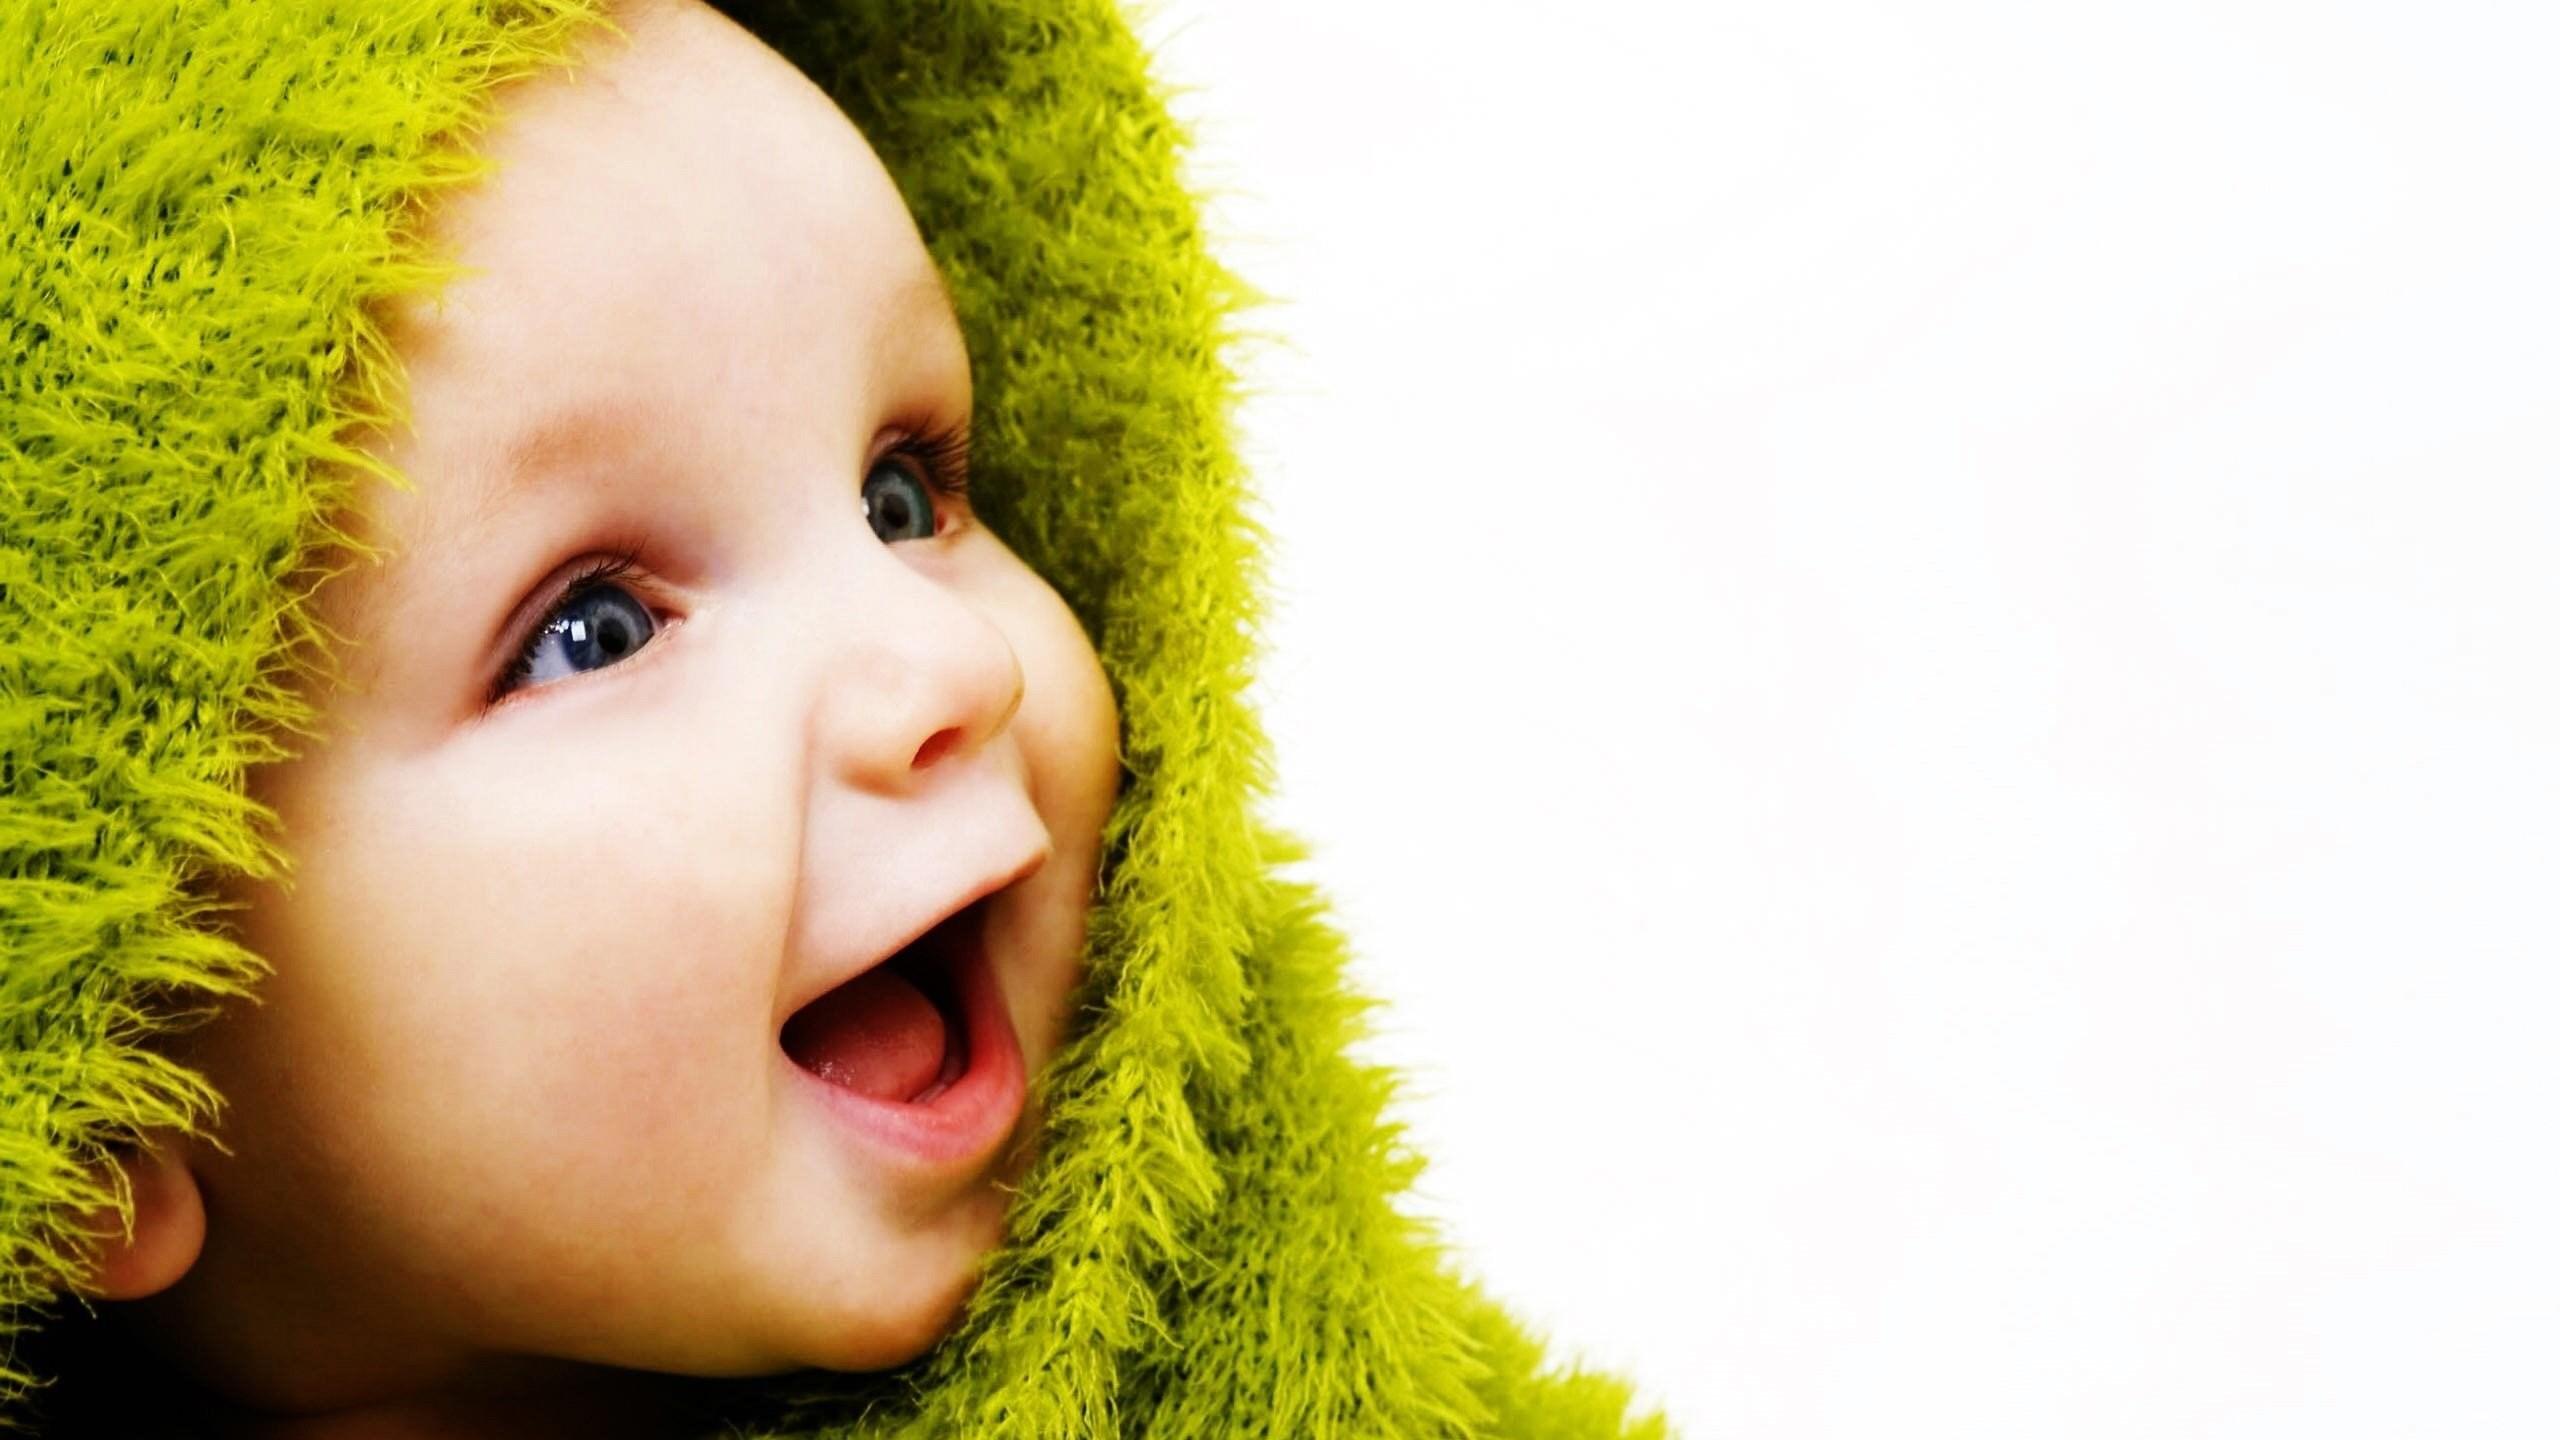 Little Cute Baby Boy Full Hd Large Widescreen Wallpapers Large Desktop Background